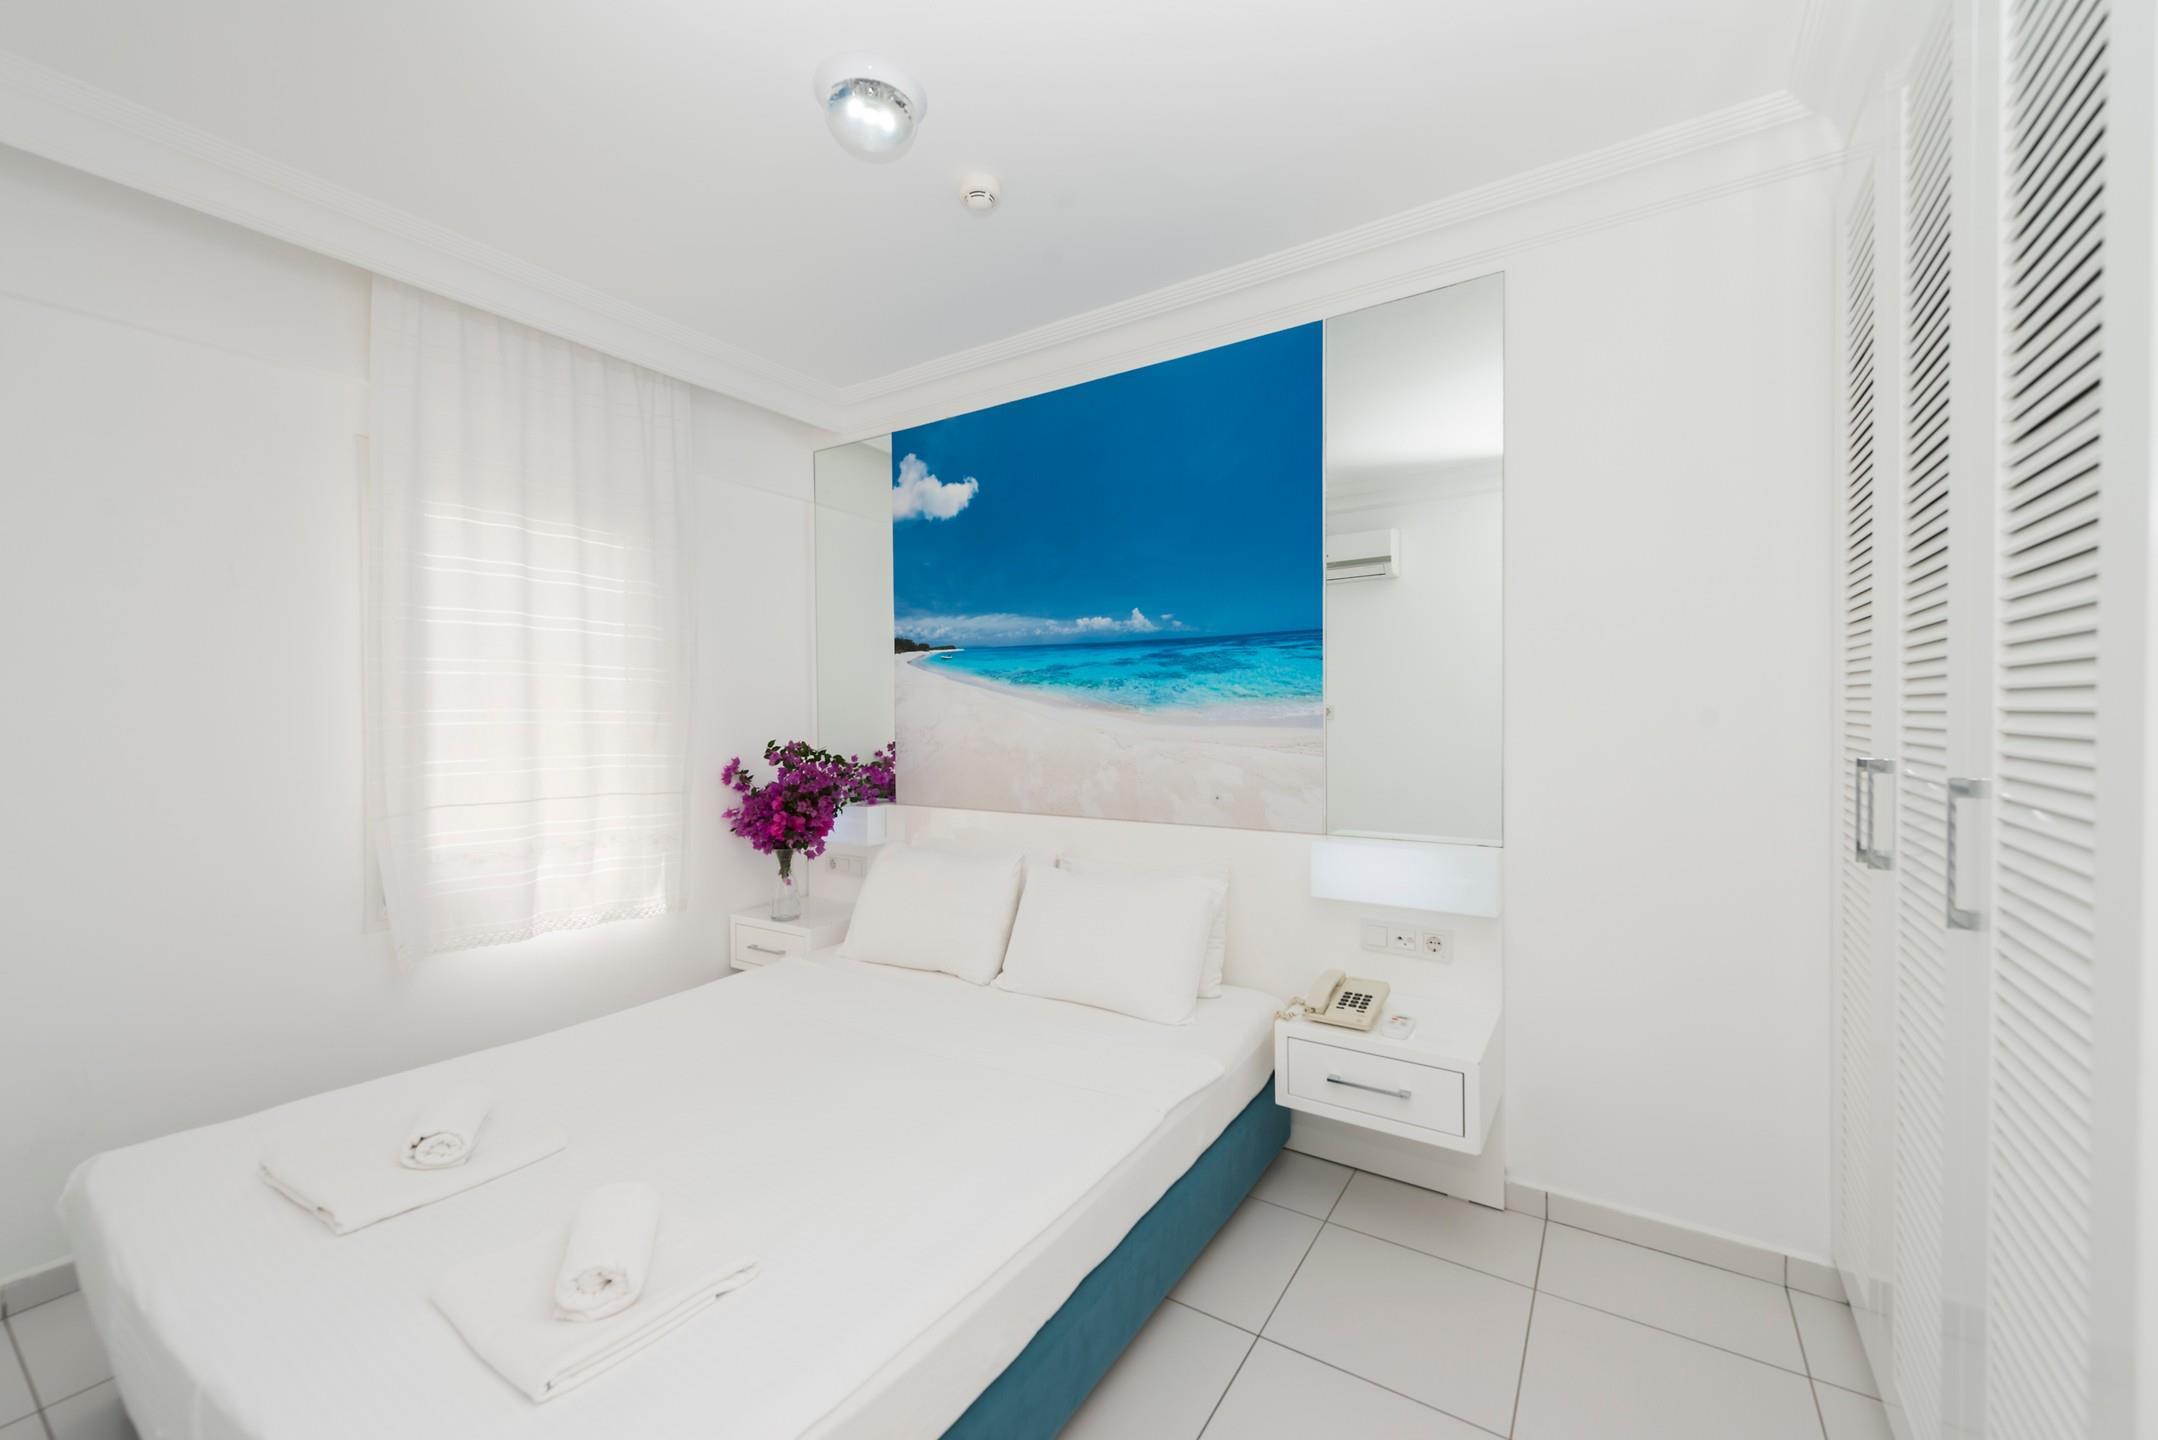 bendis-beach-hotel-genel-007